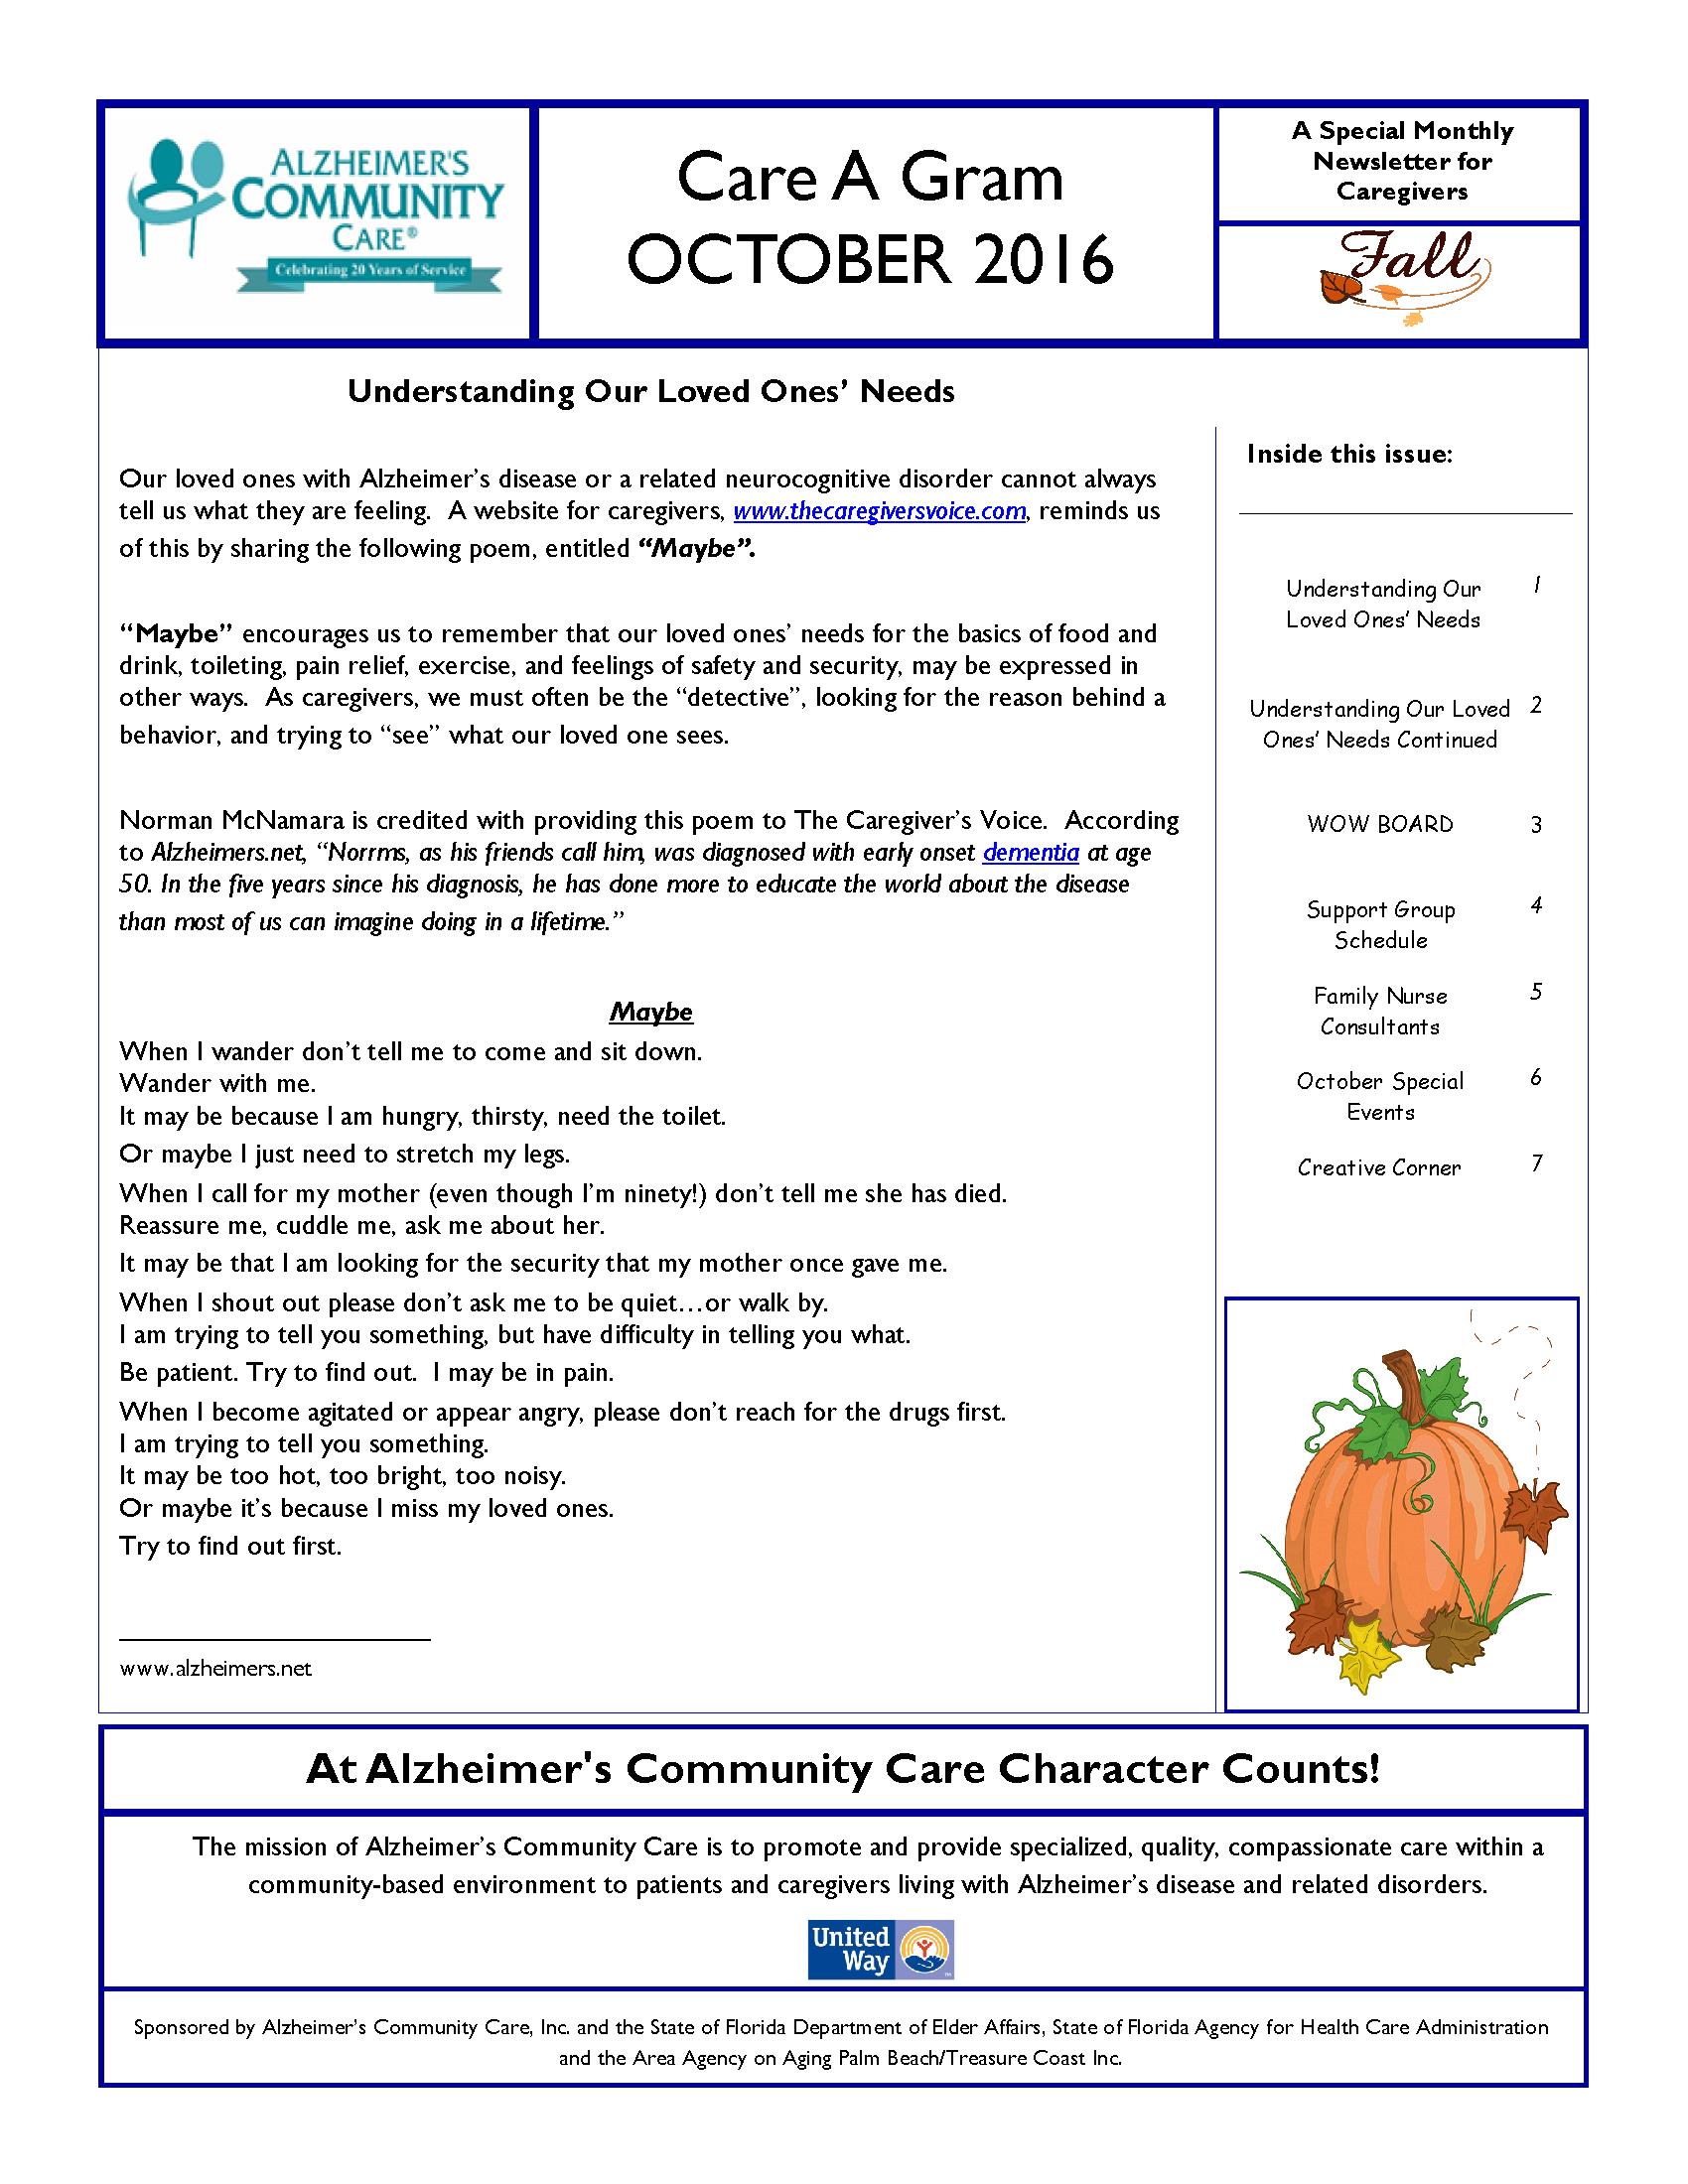 October 2016 Care A Gram